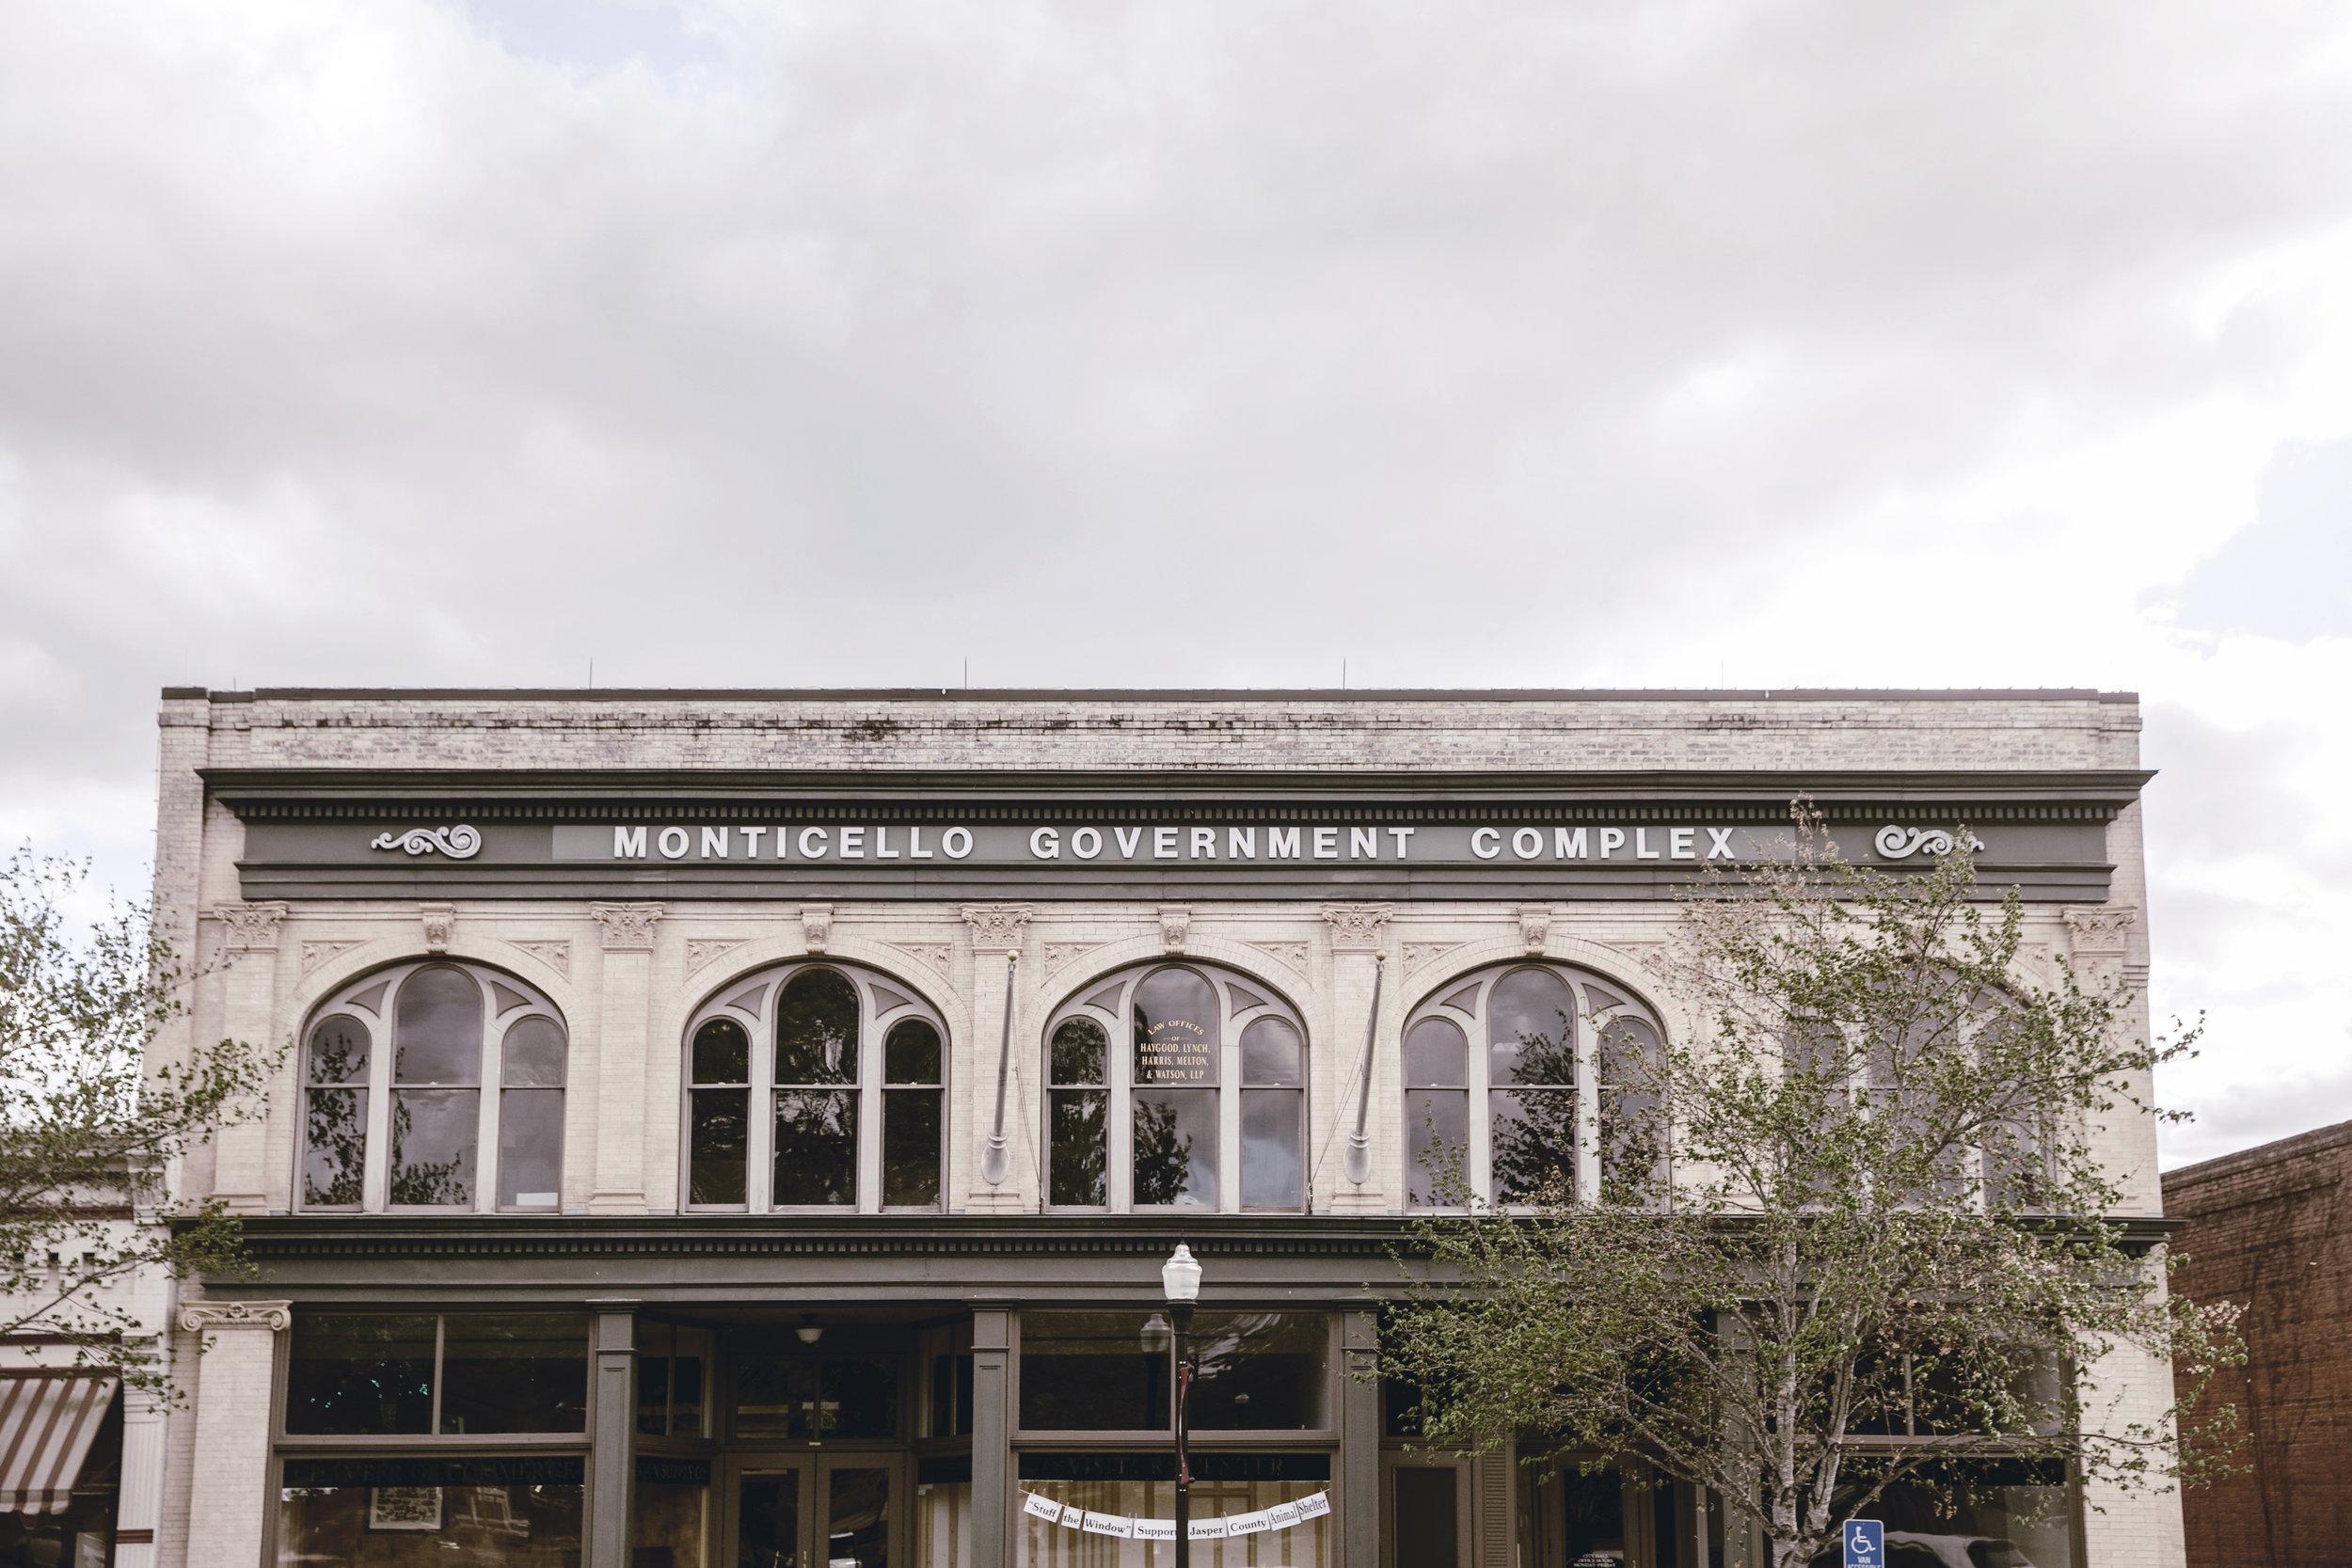 Monticello Government Complex / Benton Supply Co Building / Monticello GA / heirloomed